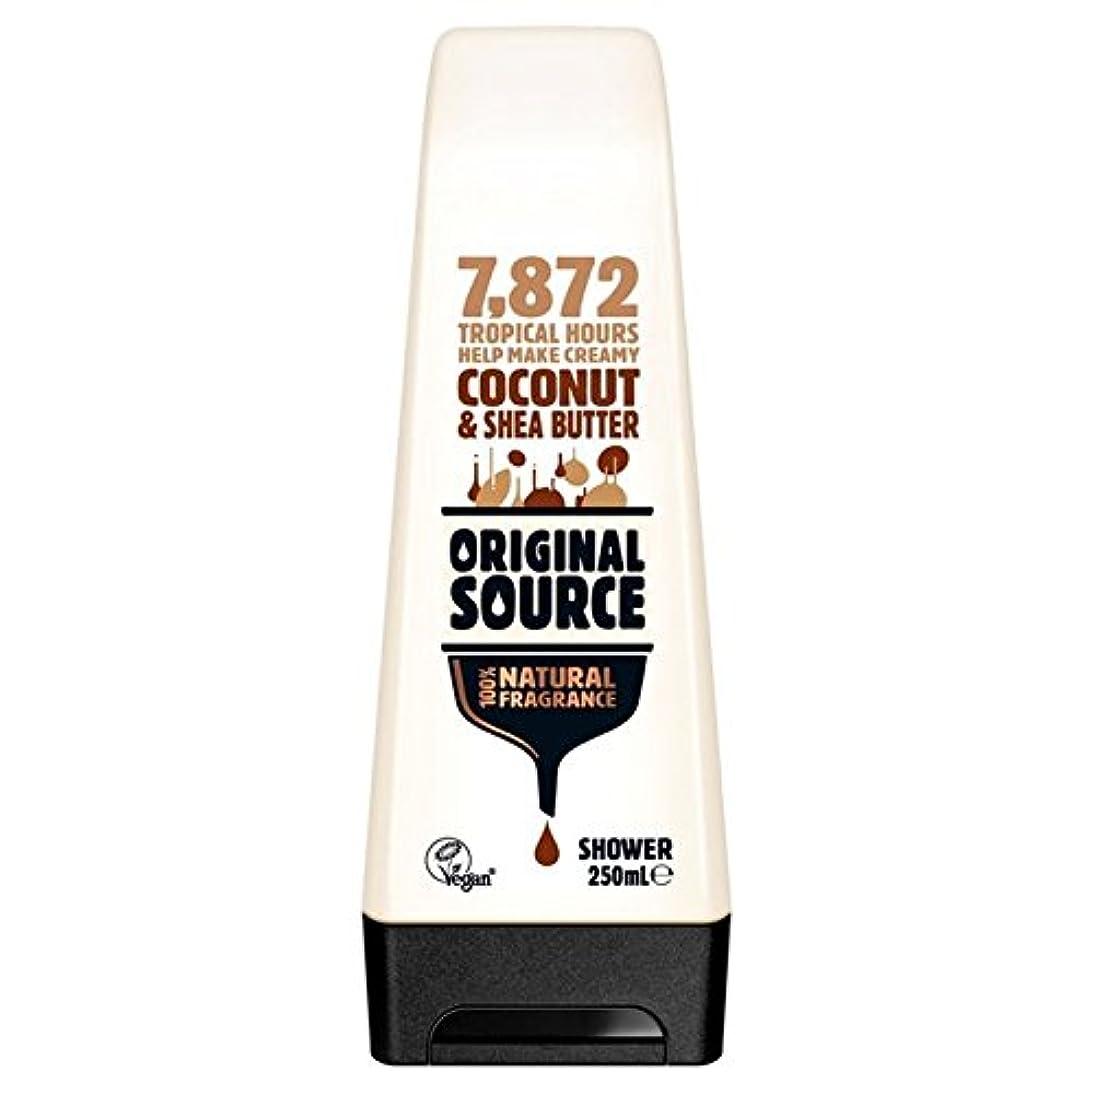 Original Source Moisturising Coconut & Shea Butter Shower Gel 250ml - 元のソース保湿ココナッツ&シアバターシャワージェル250ミリリットル [並行輸入品]